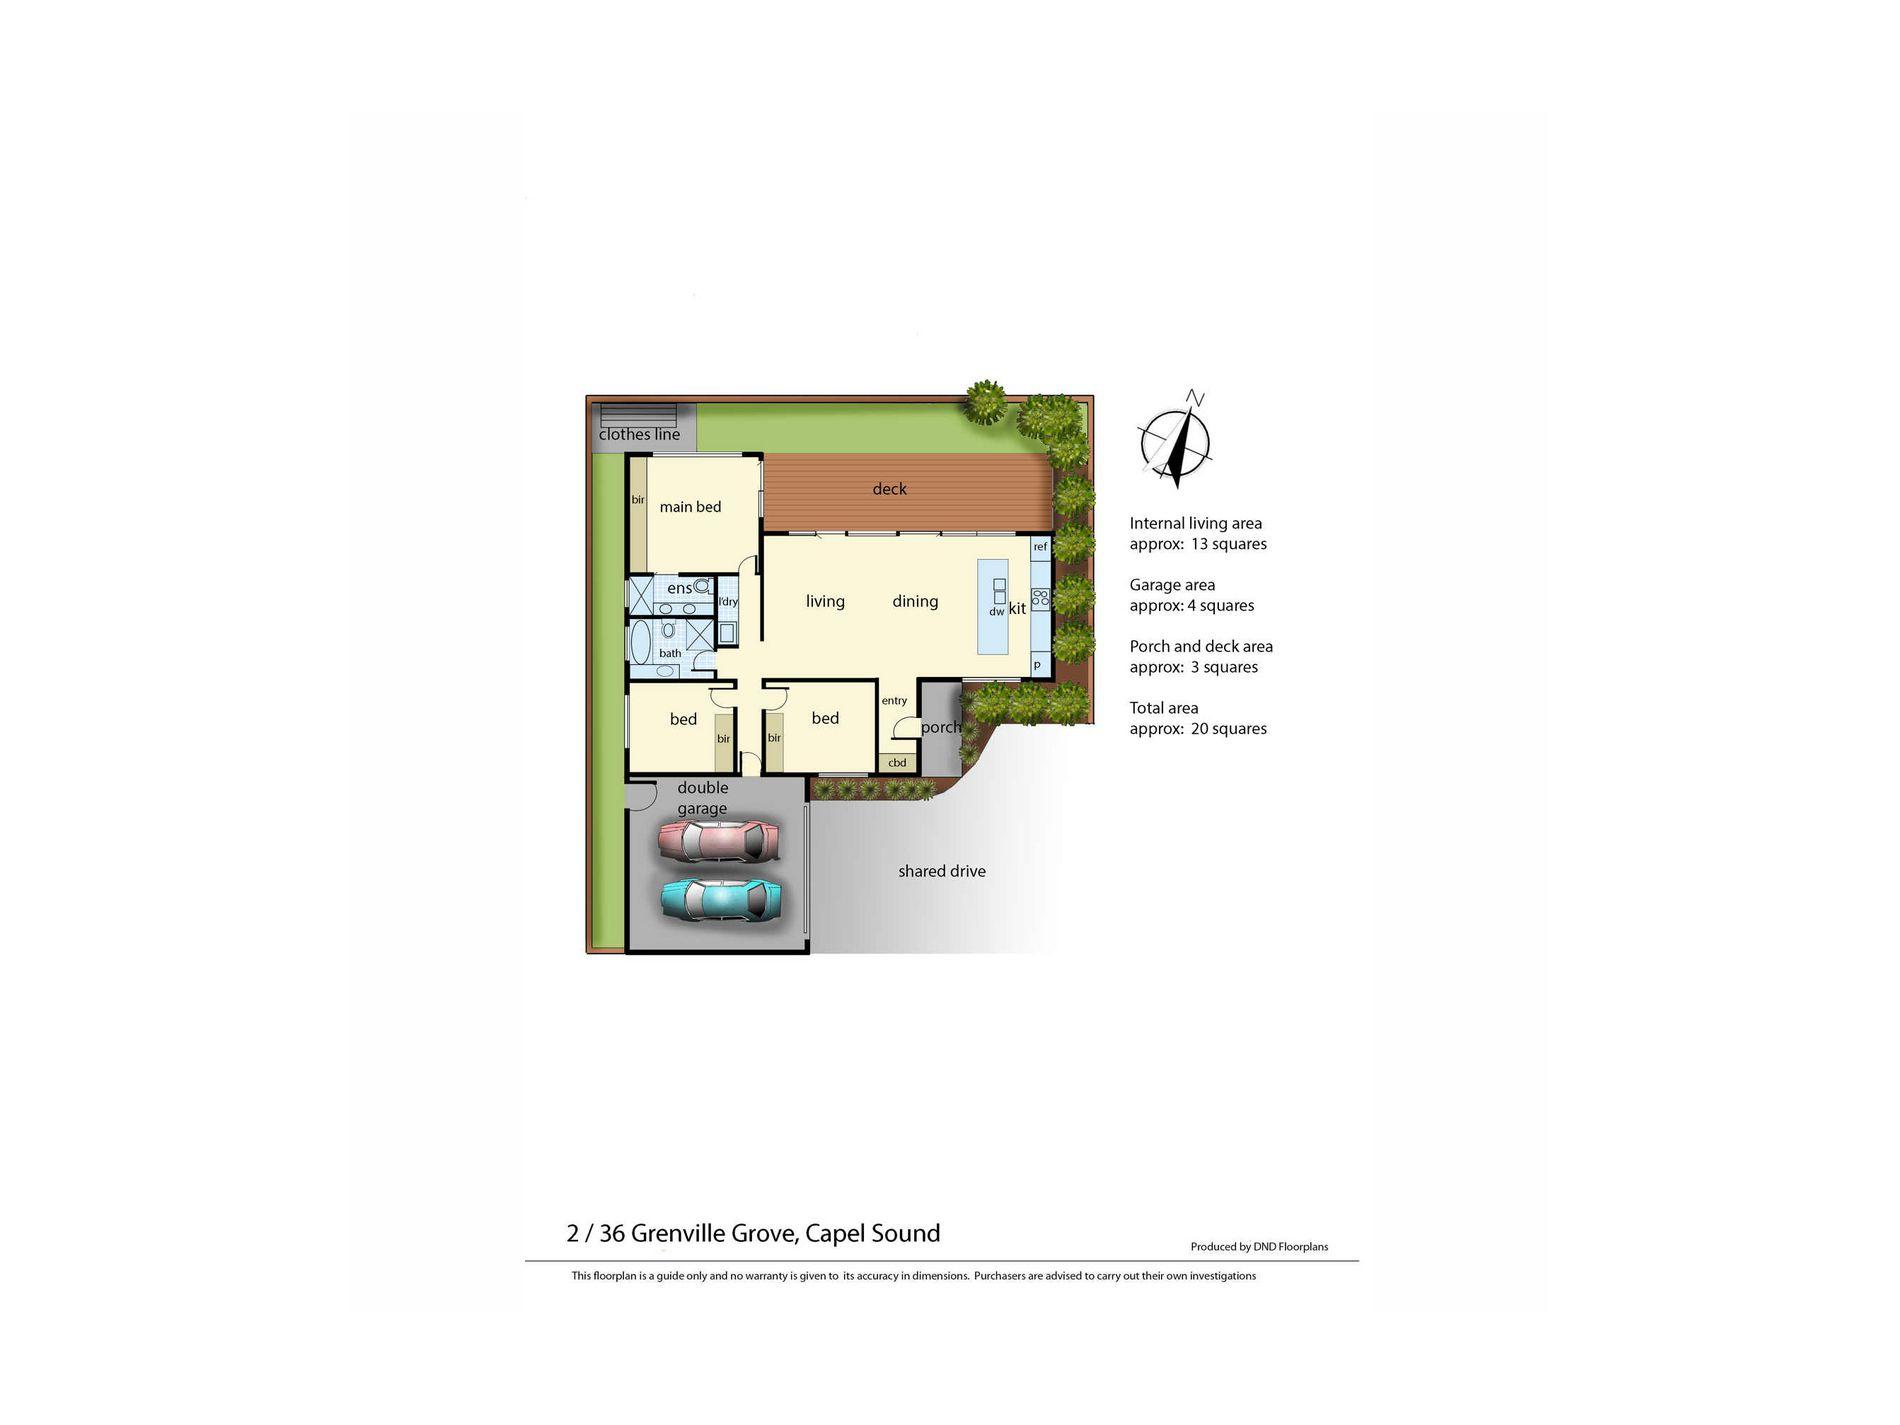 Lot 2, 36 Grenville Grove, Capel Sound